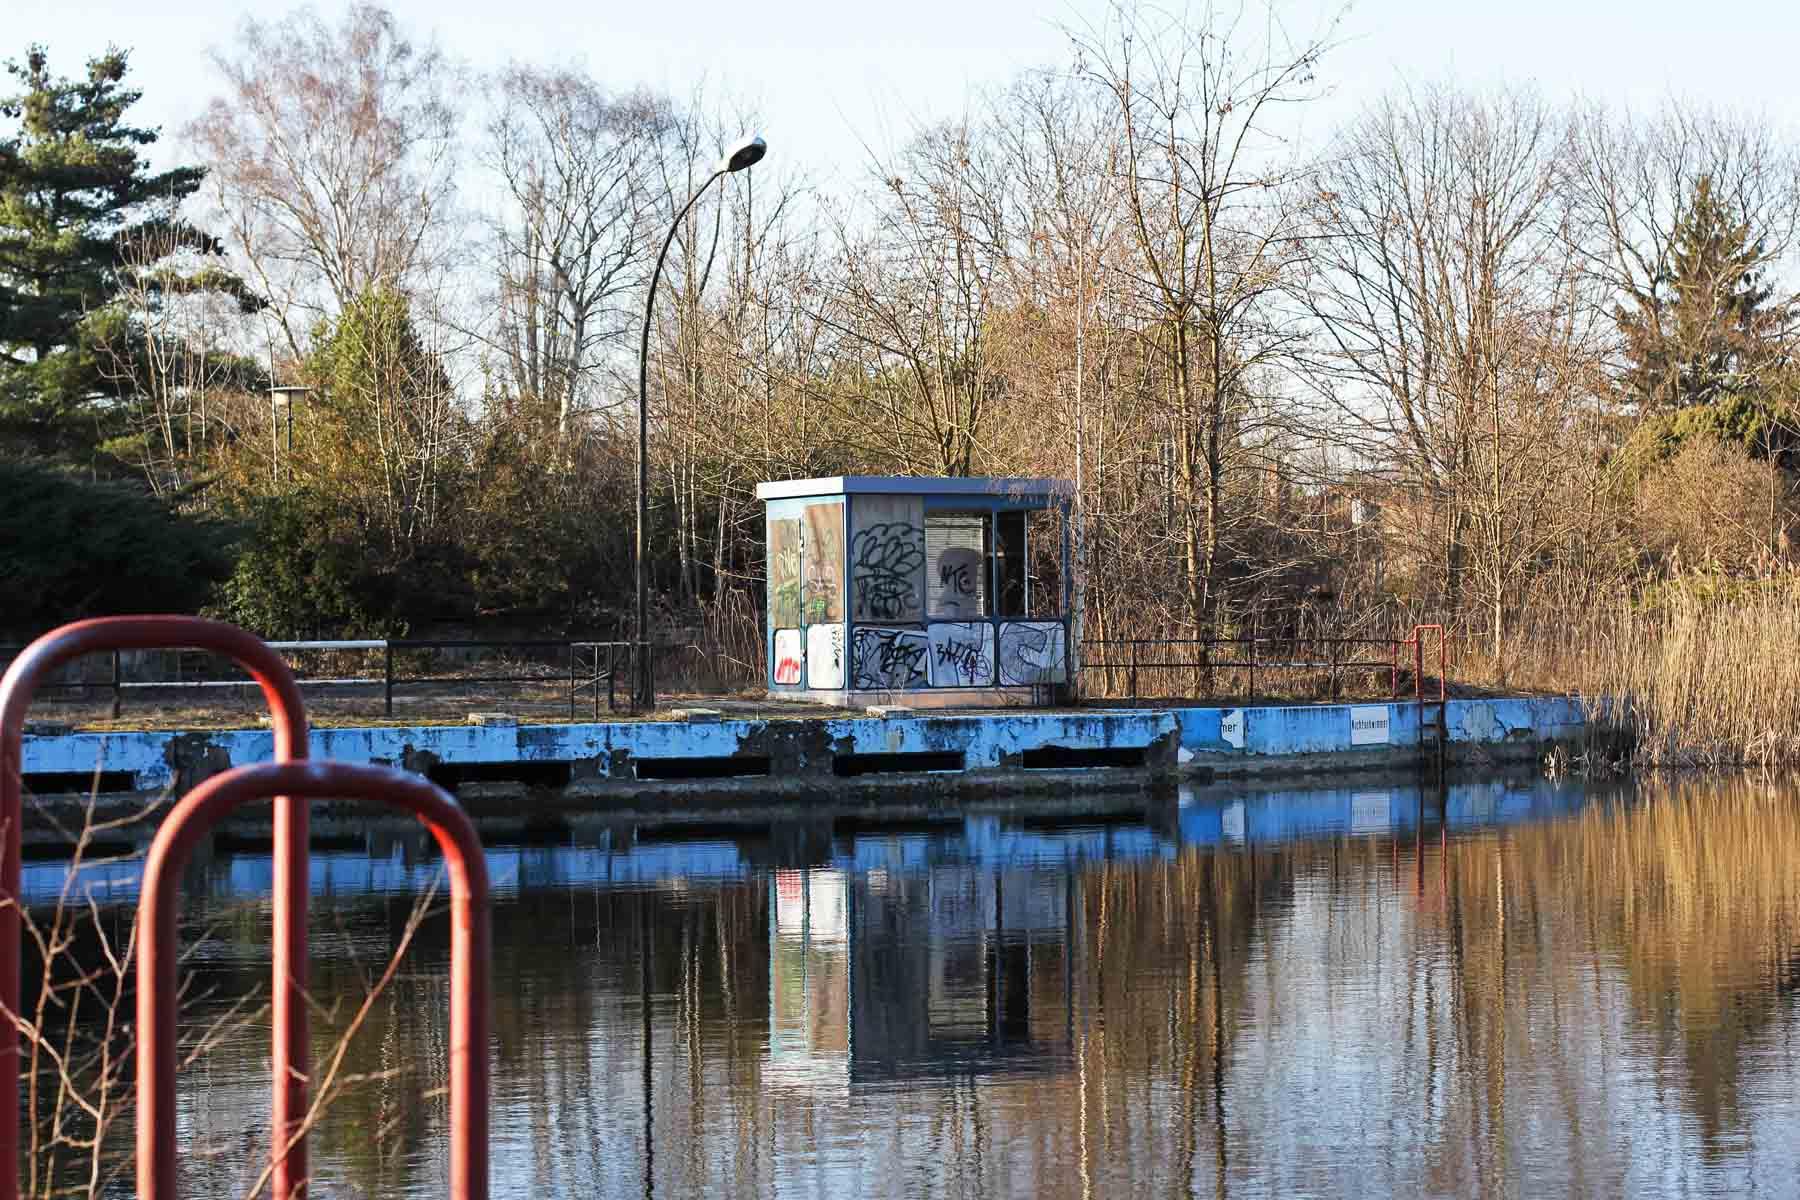 Wernerbad Berlin Hippo Habitat Under Threat